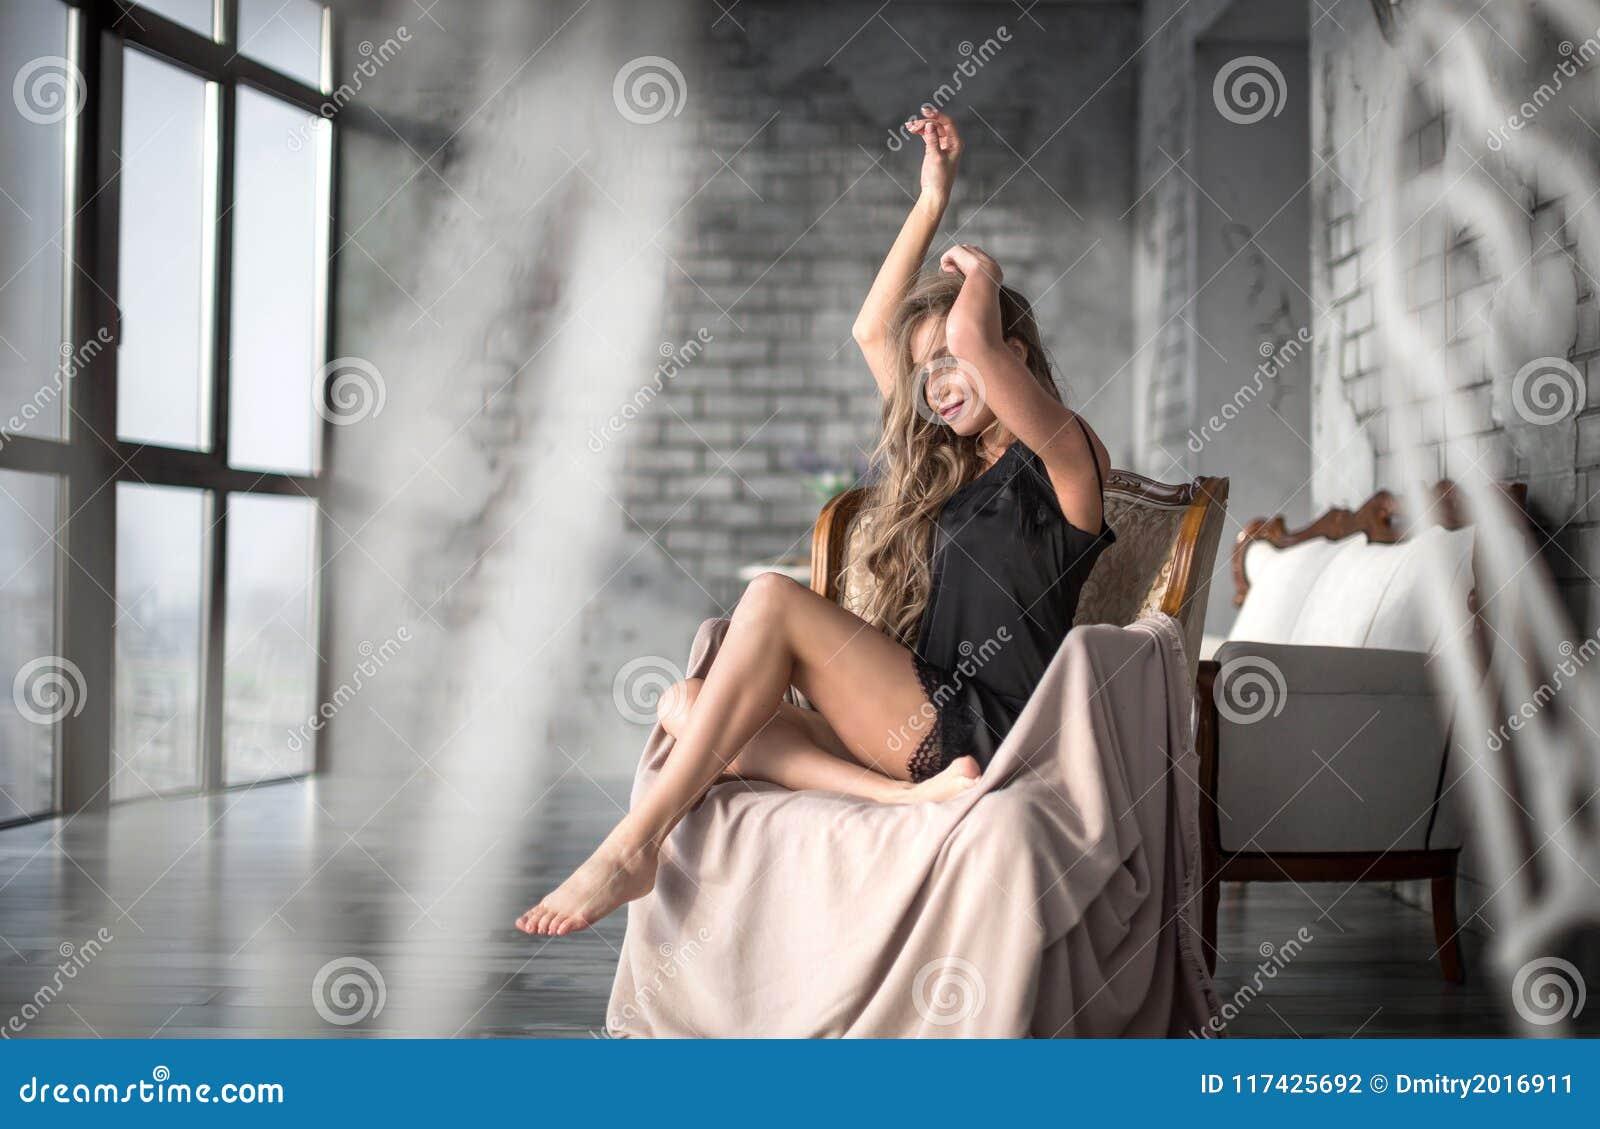 Portrait of young elegant woman. Fashion hairstyle, black short dress, armchair